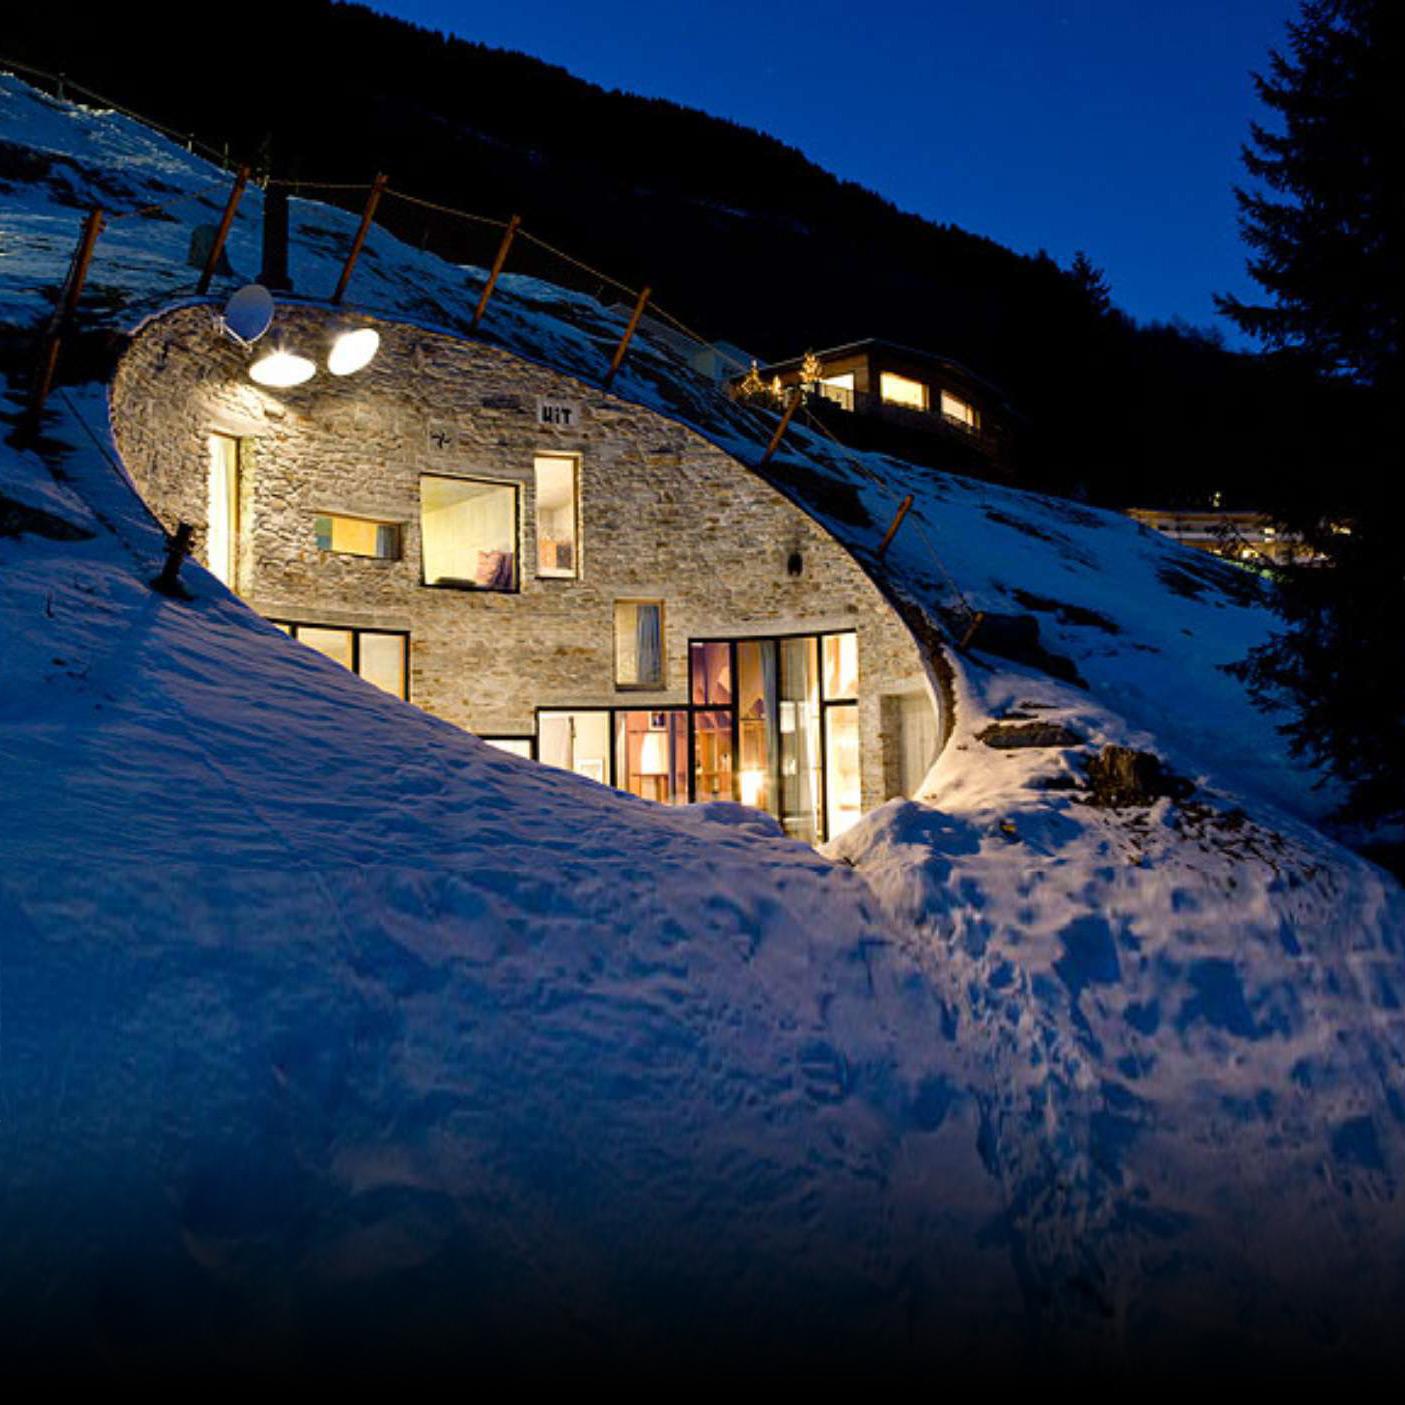 villa vals a unique swiss alps experience haute today. Black Bedroom Furniture Sets. Home Design Ideas